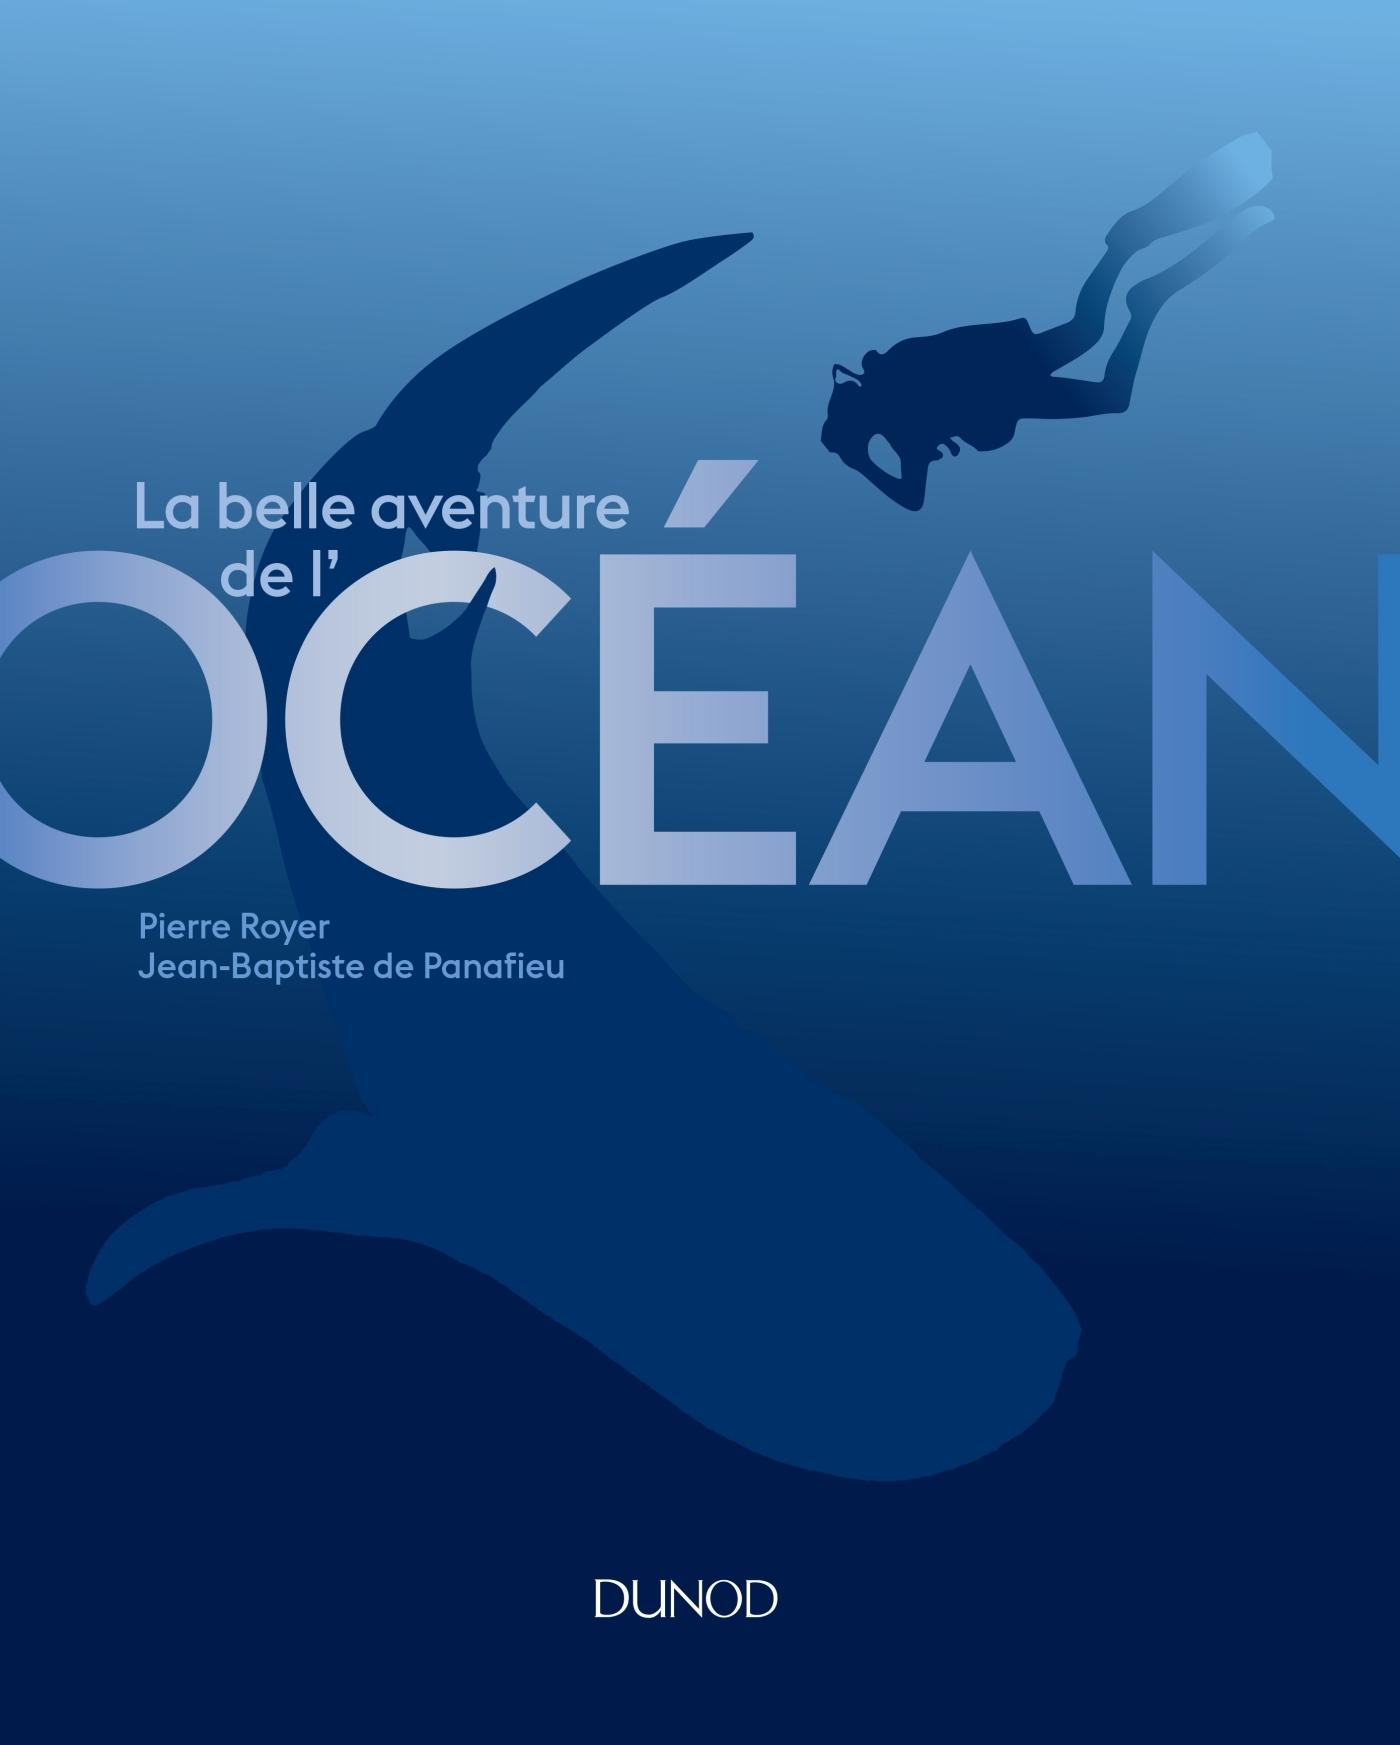 LA BELLE AVENTURE DE L'OCEAN